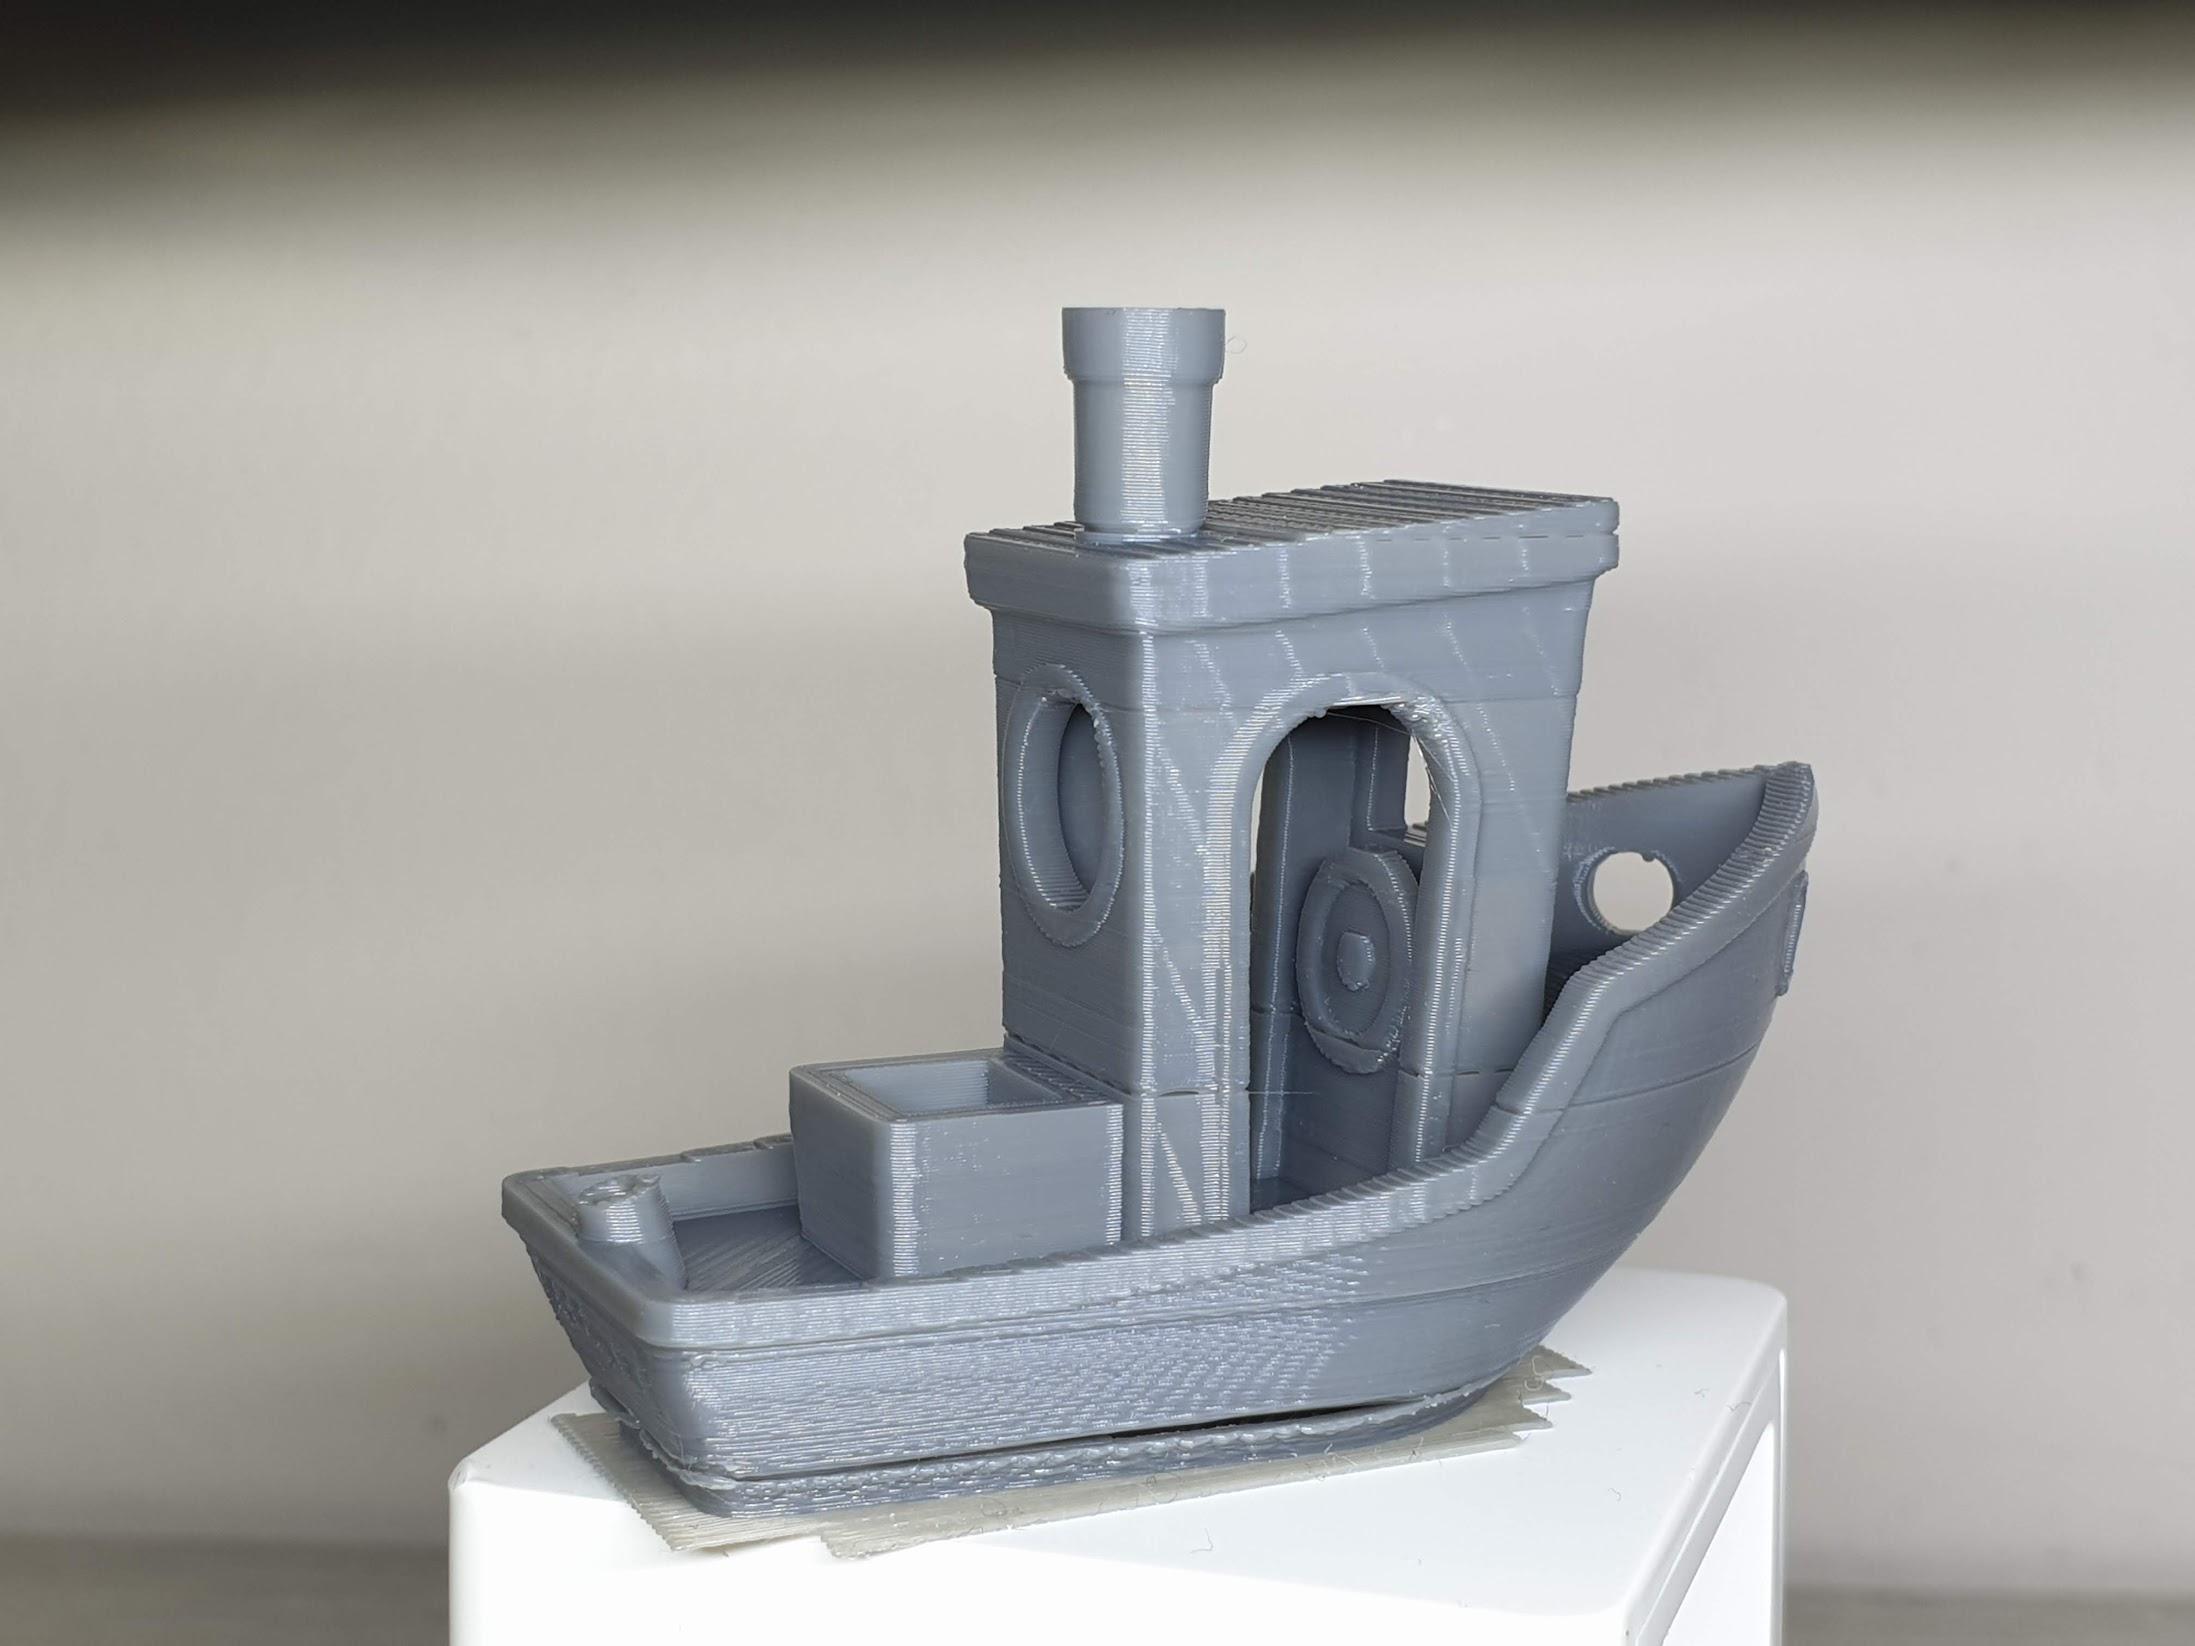 3D Benchy 5 | Cube2 Mini Review - 3D Printer for Kids